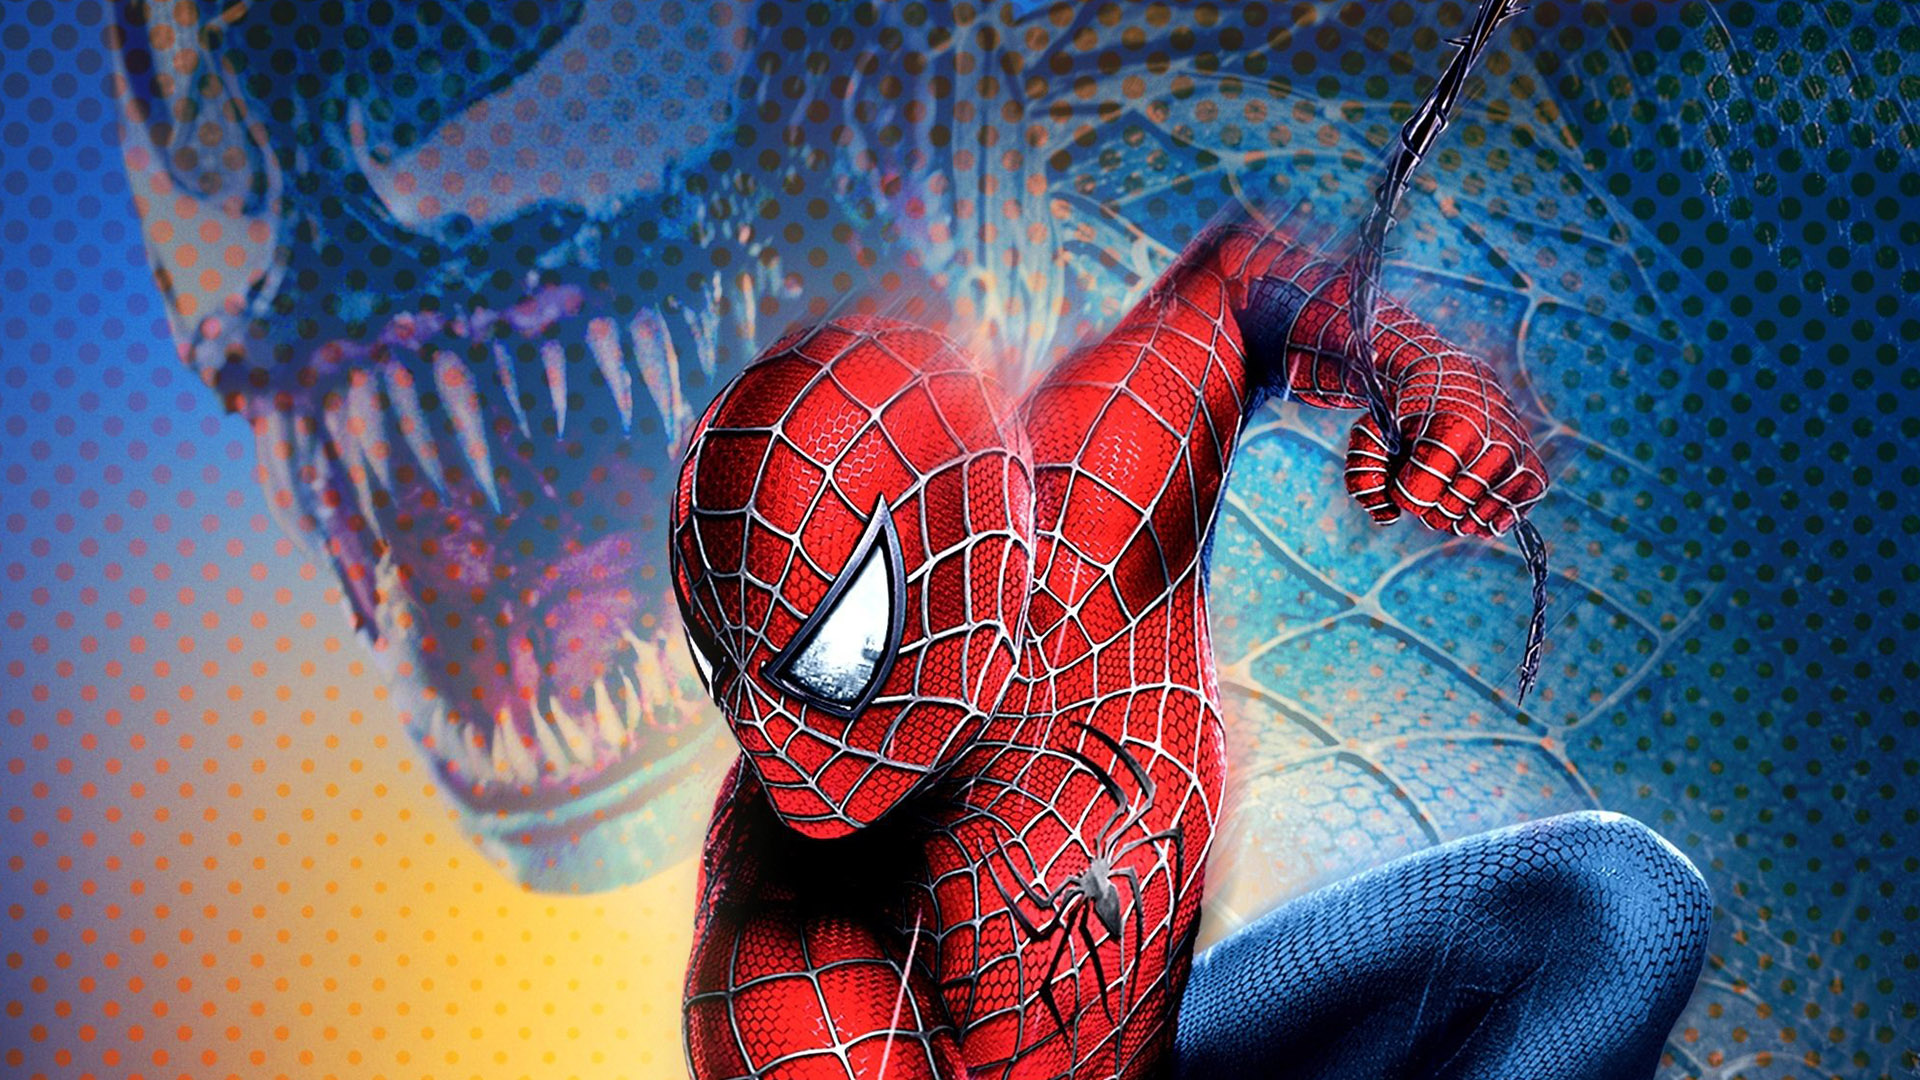 Spider Man 3 Hd Wallpaper Background Image 1920x1080 Id 882646